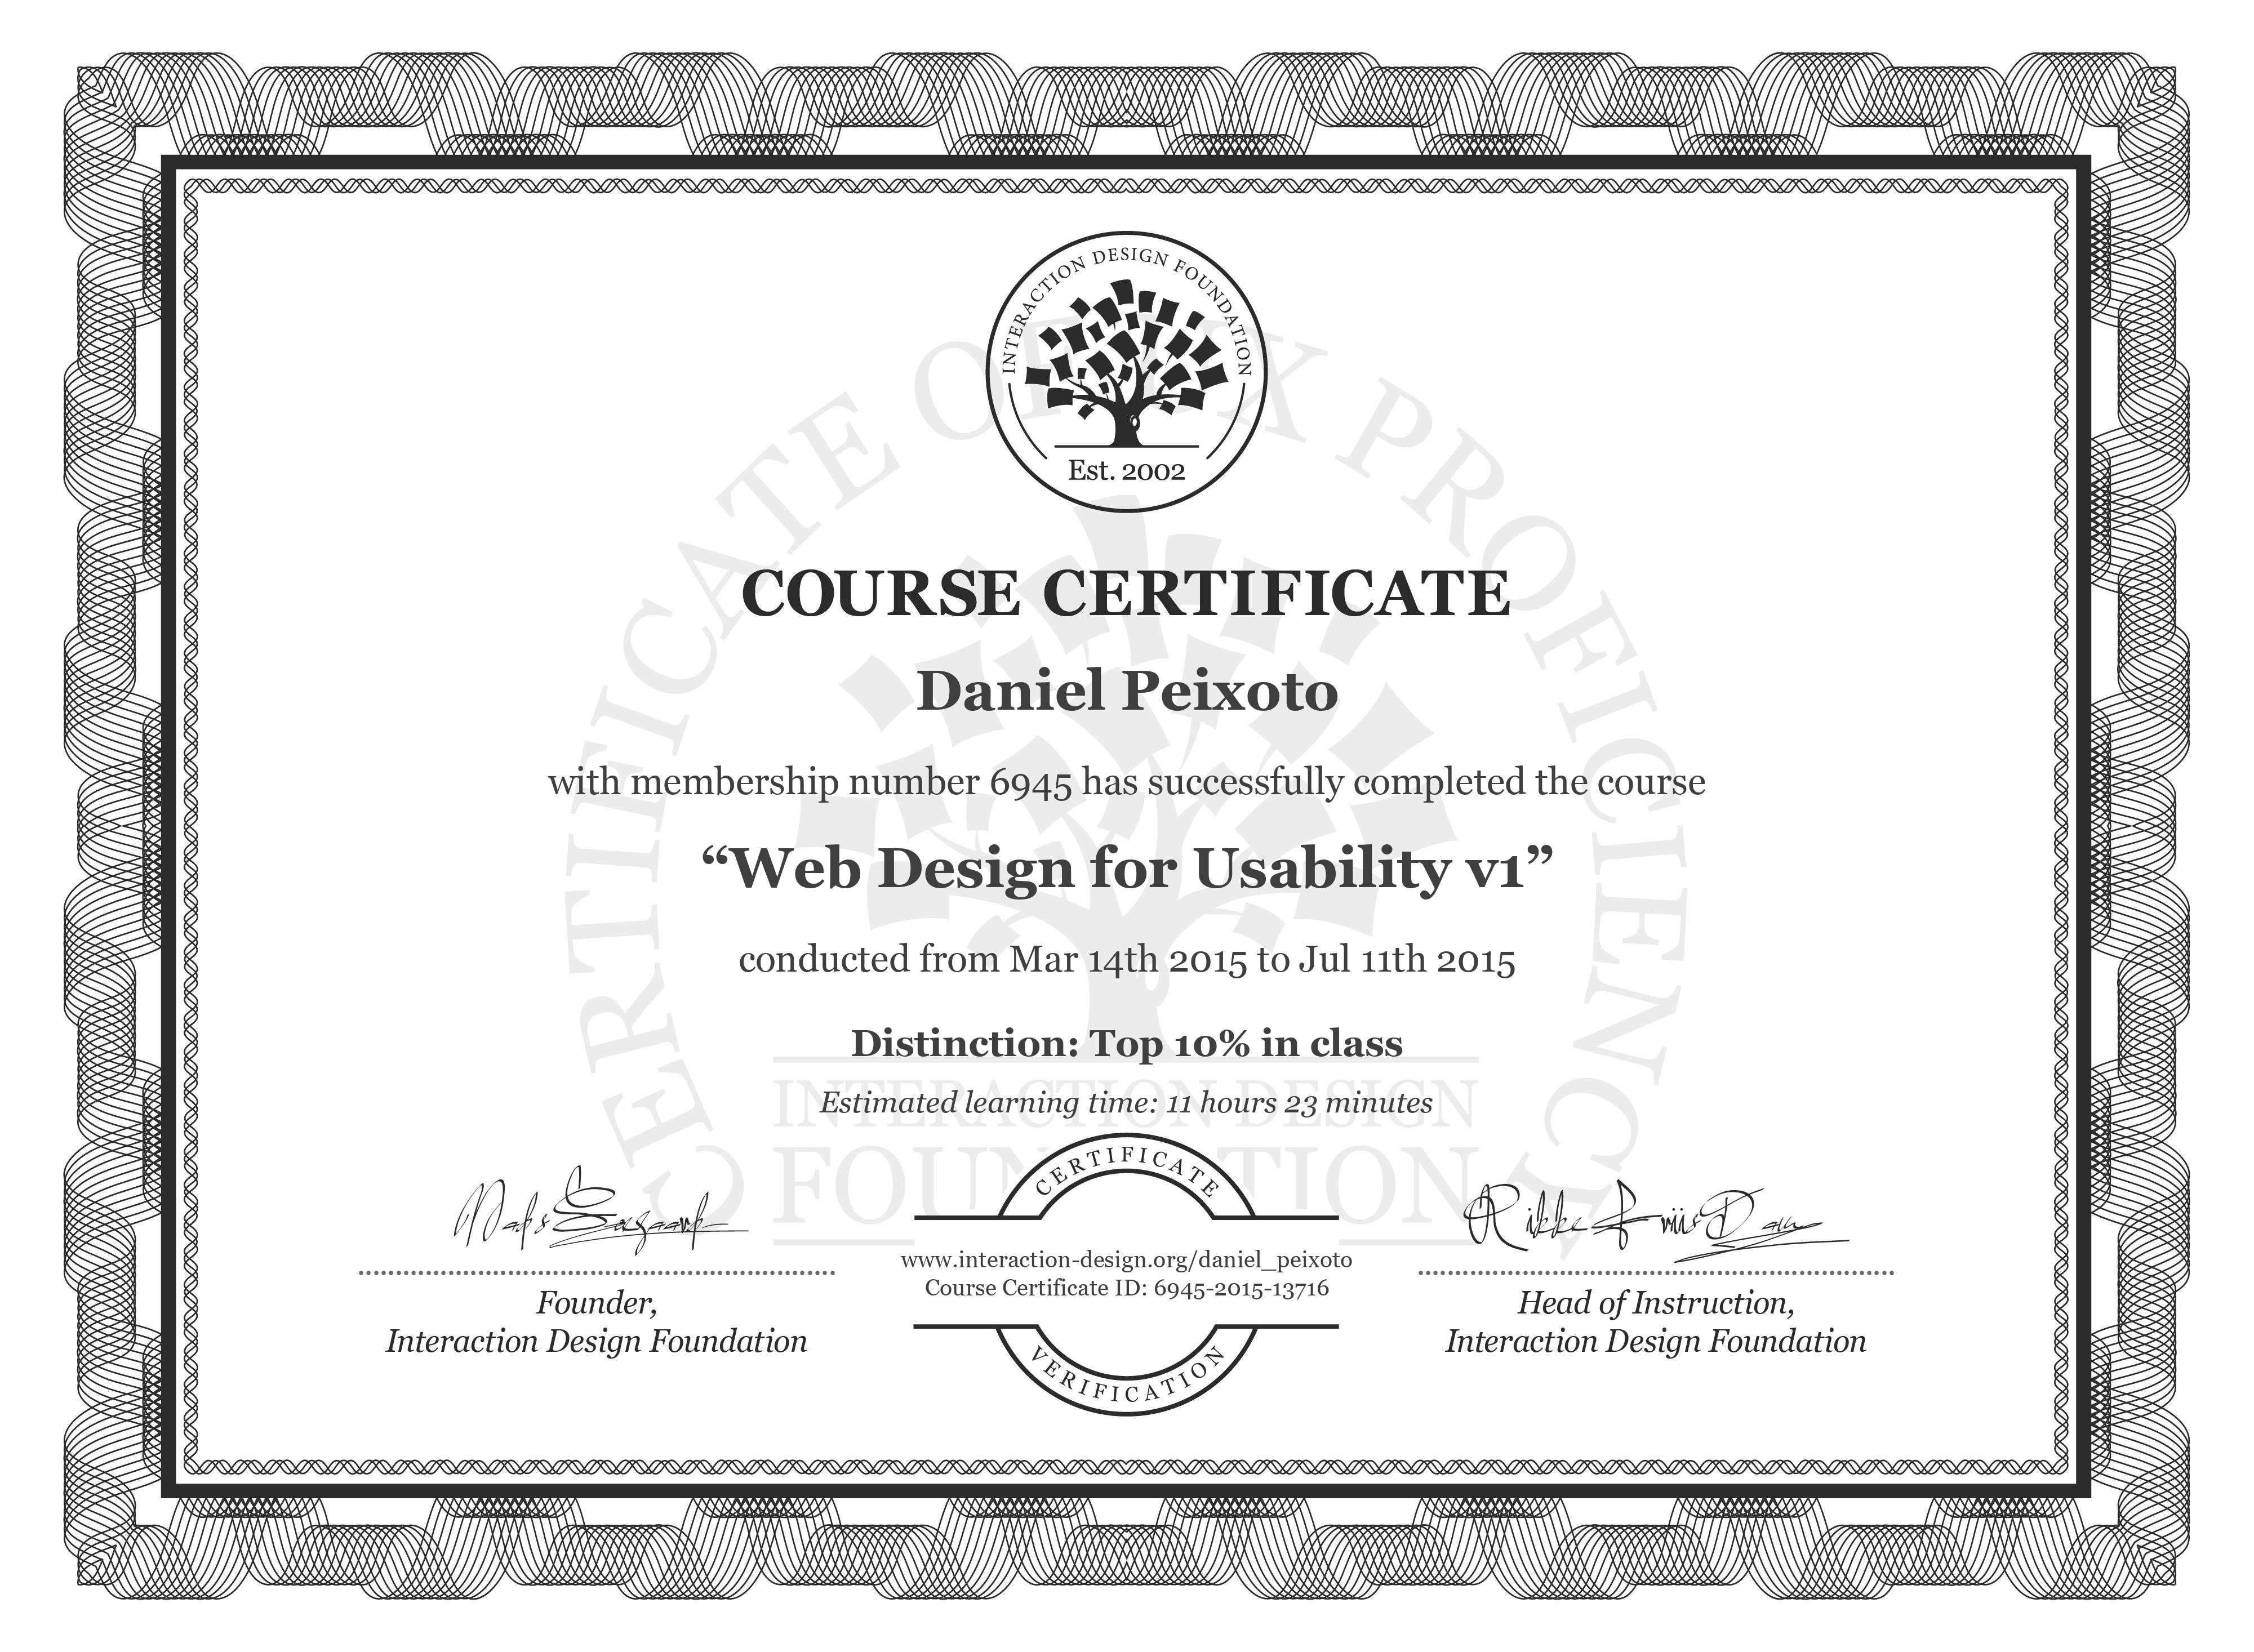 Daniel Peixoto's Course Certificate: Web Design for Usability